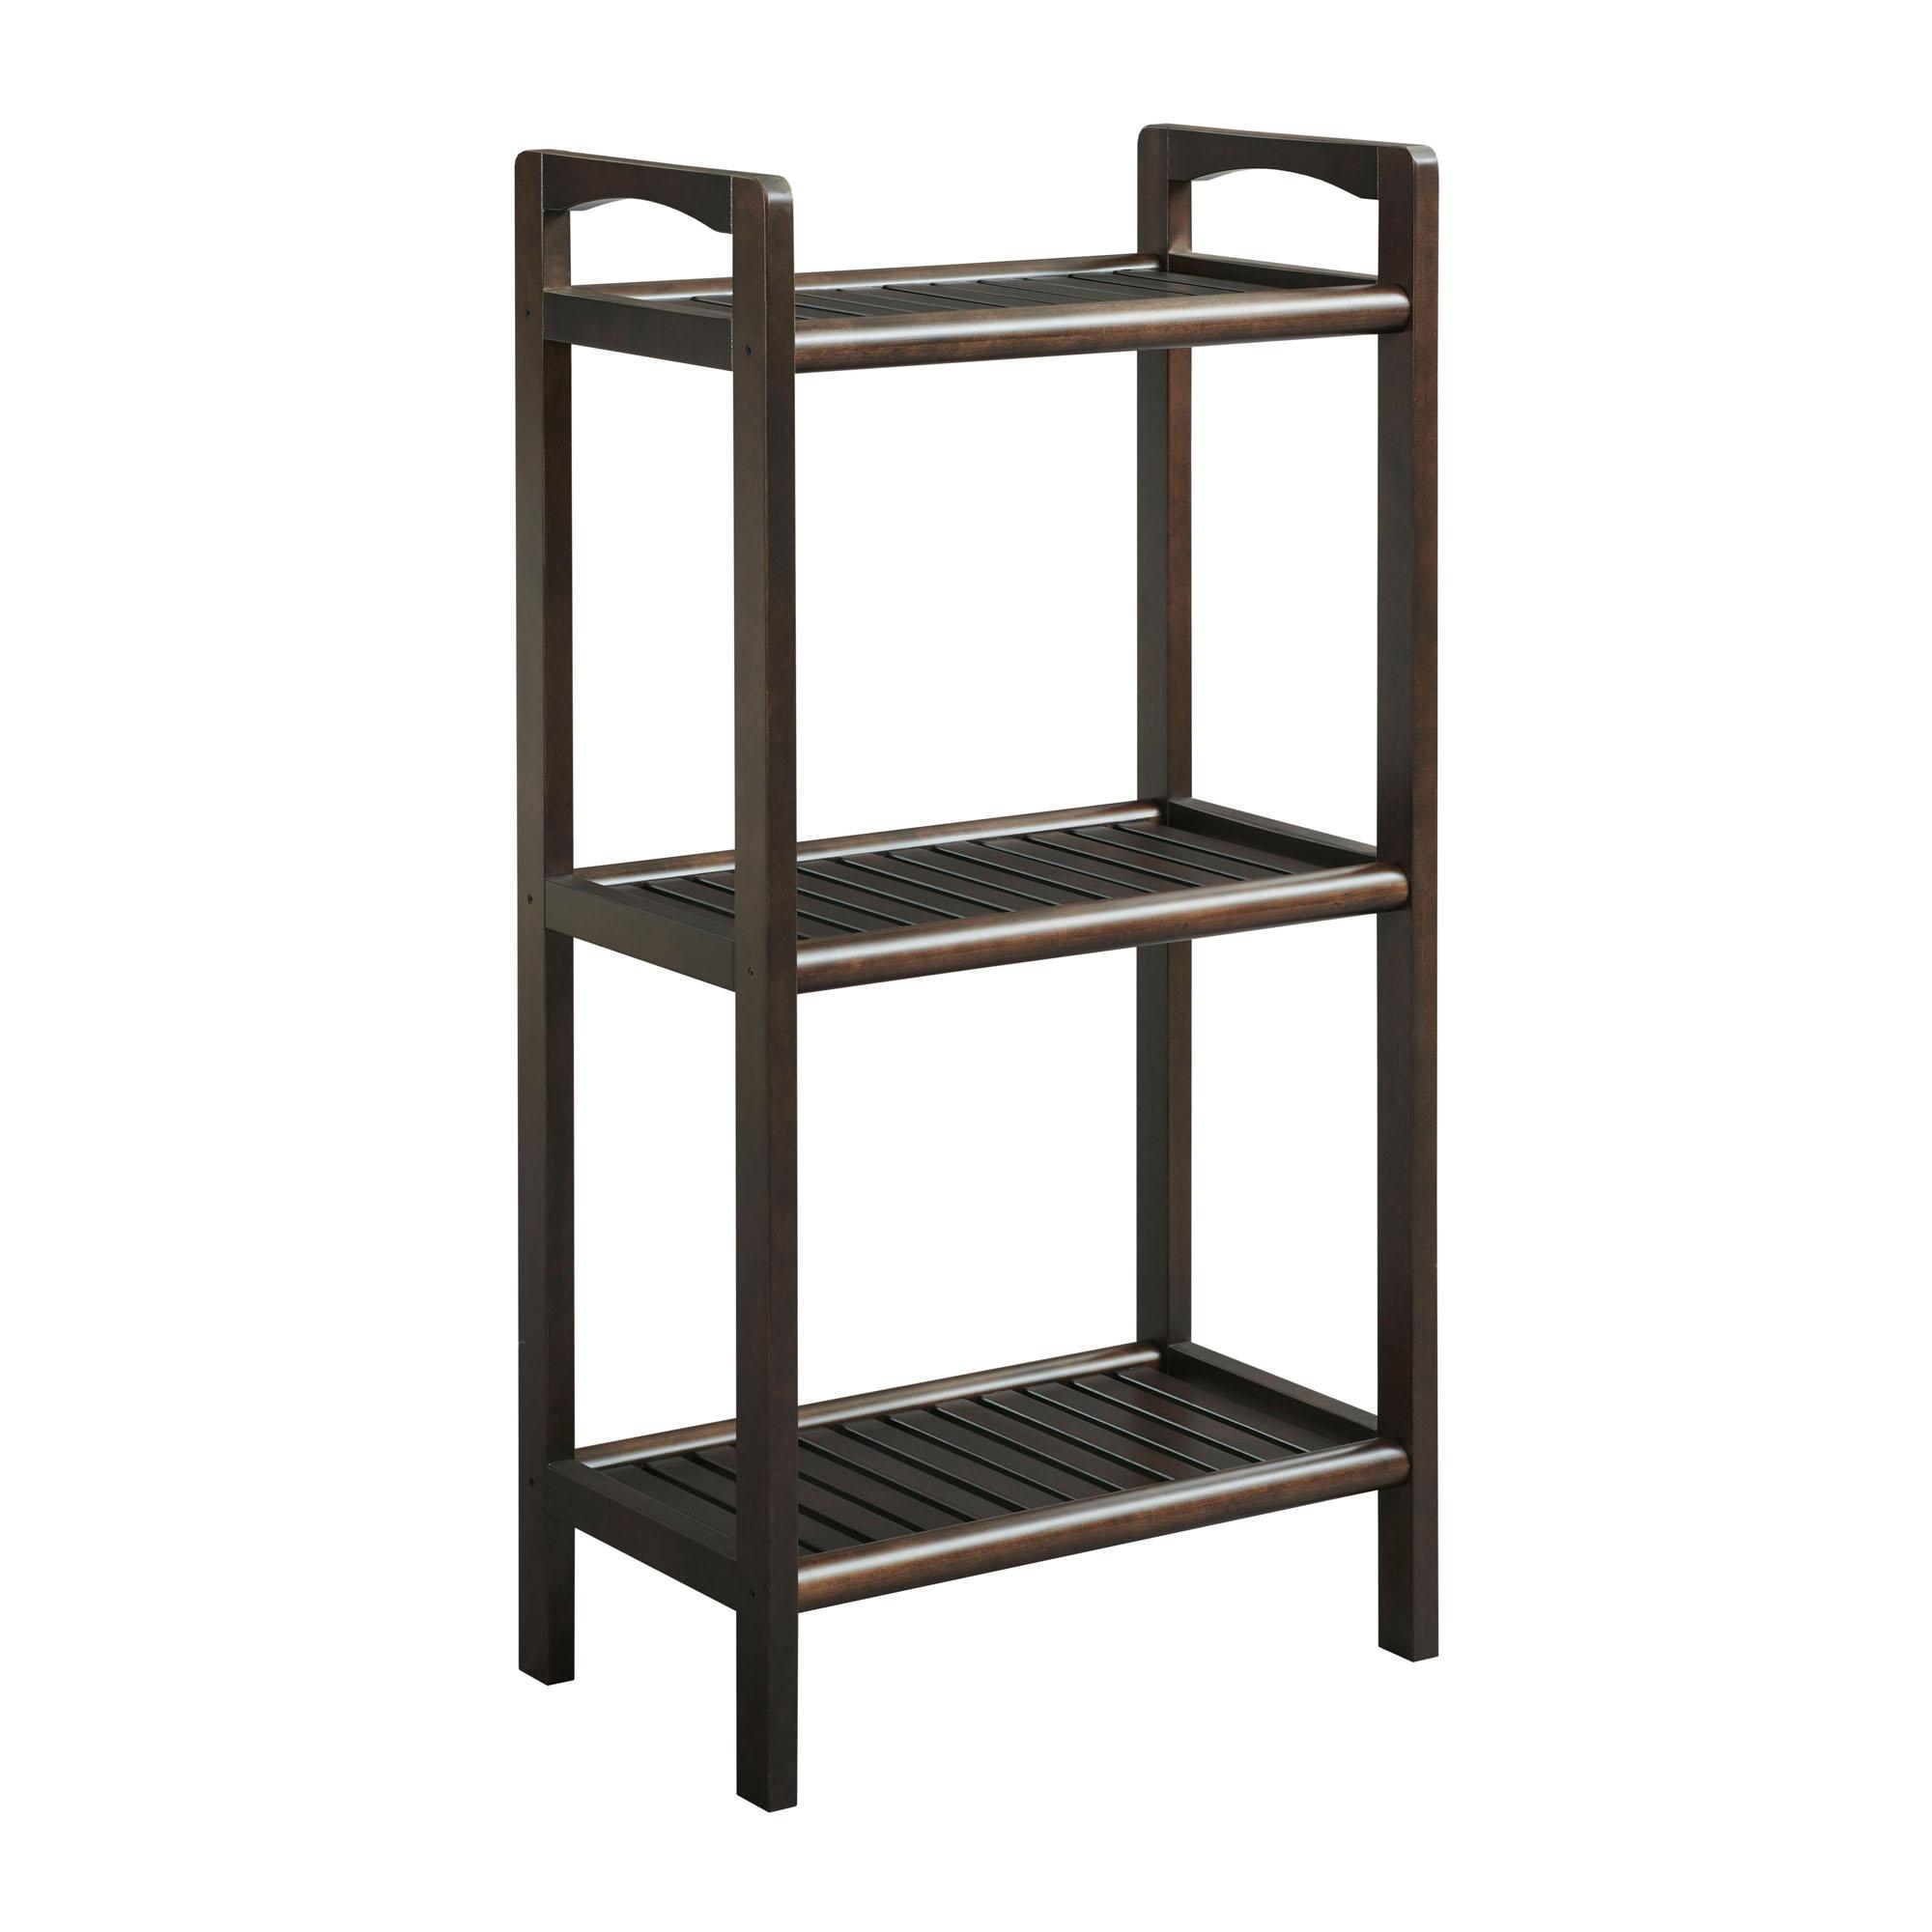 "46"" Bookcase with 3 Shelves in Espresso"